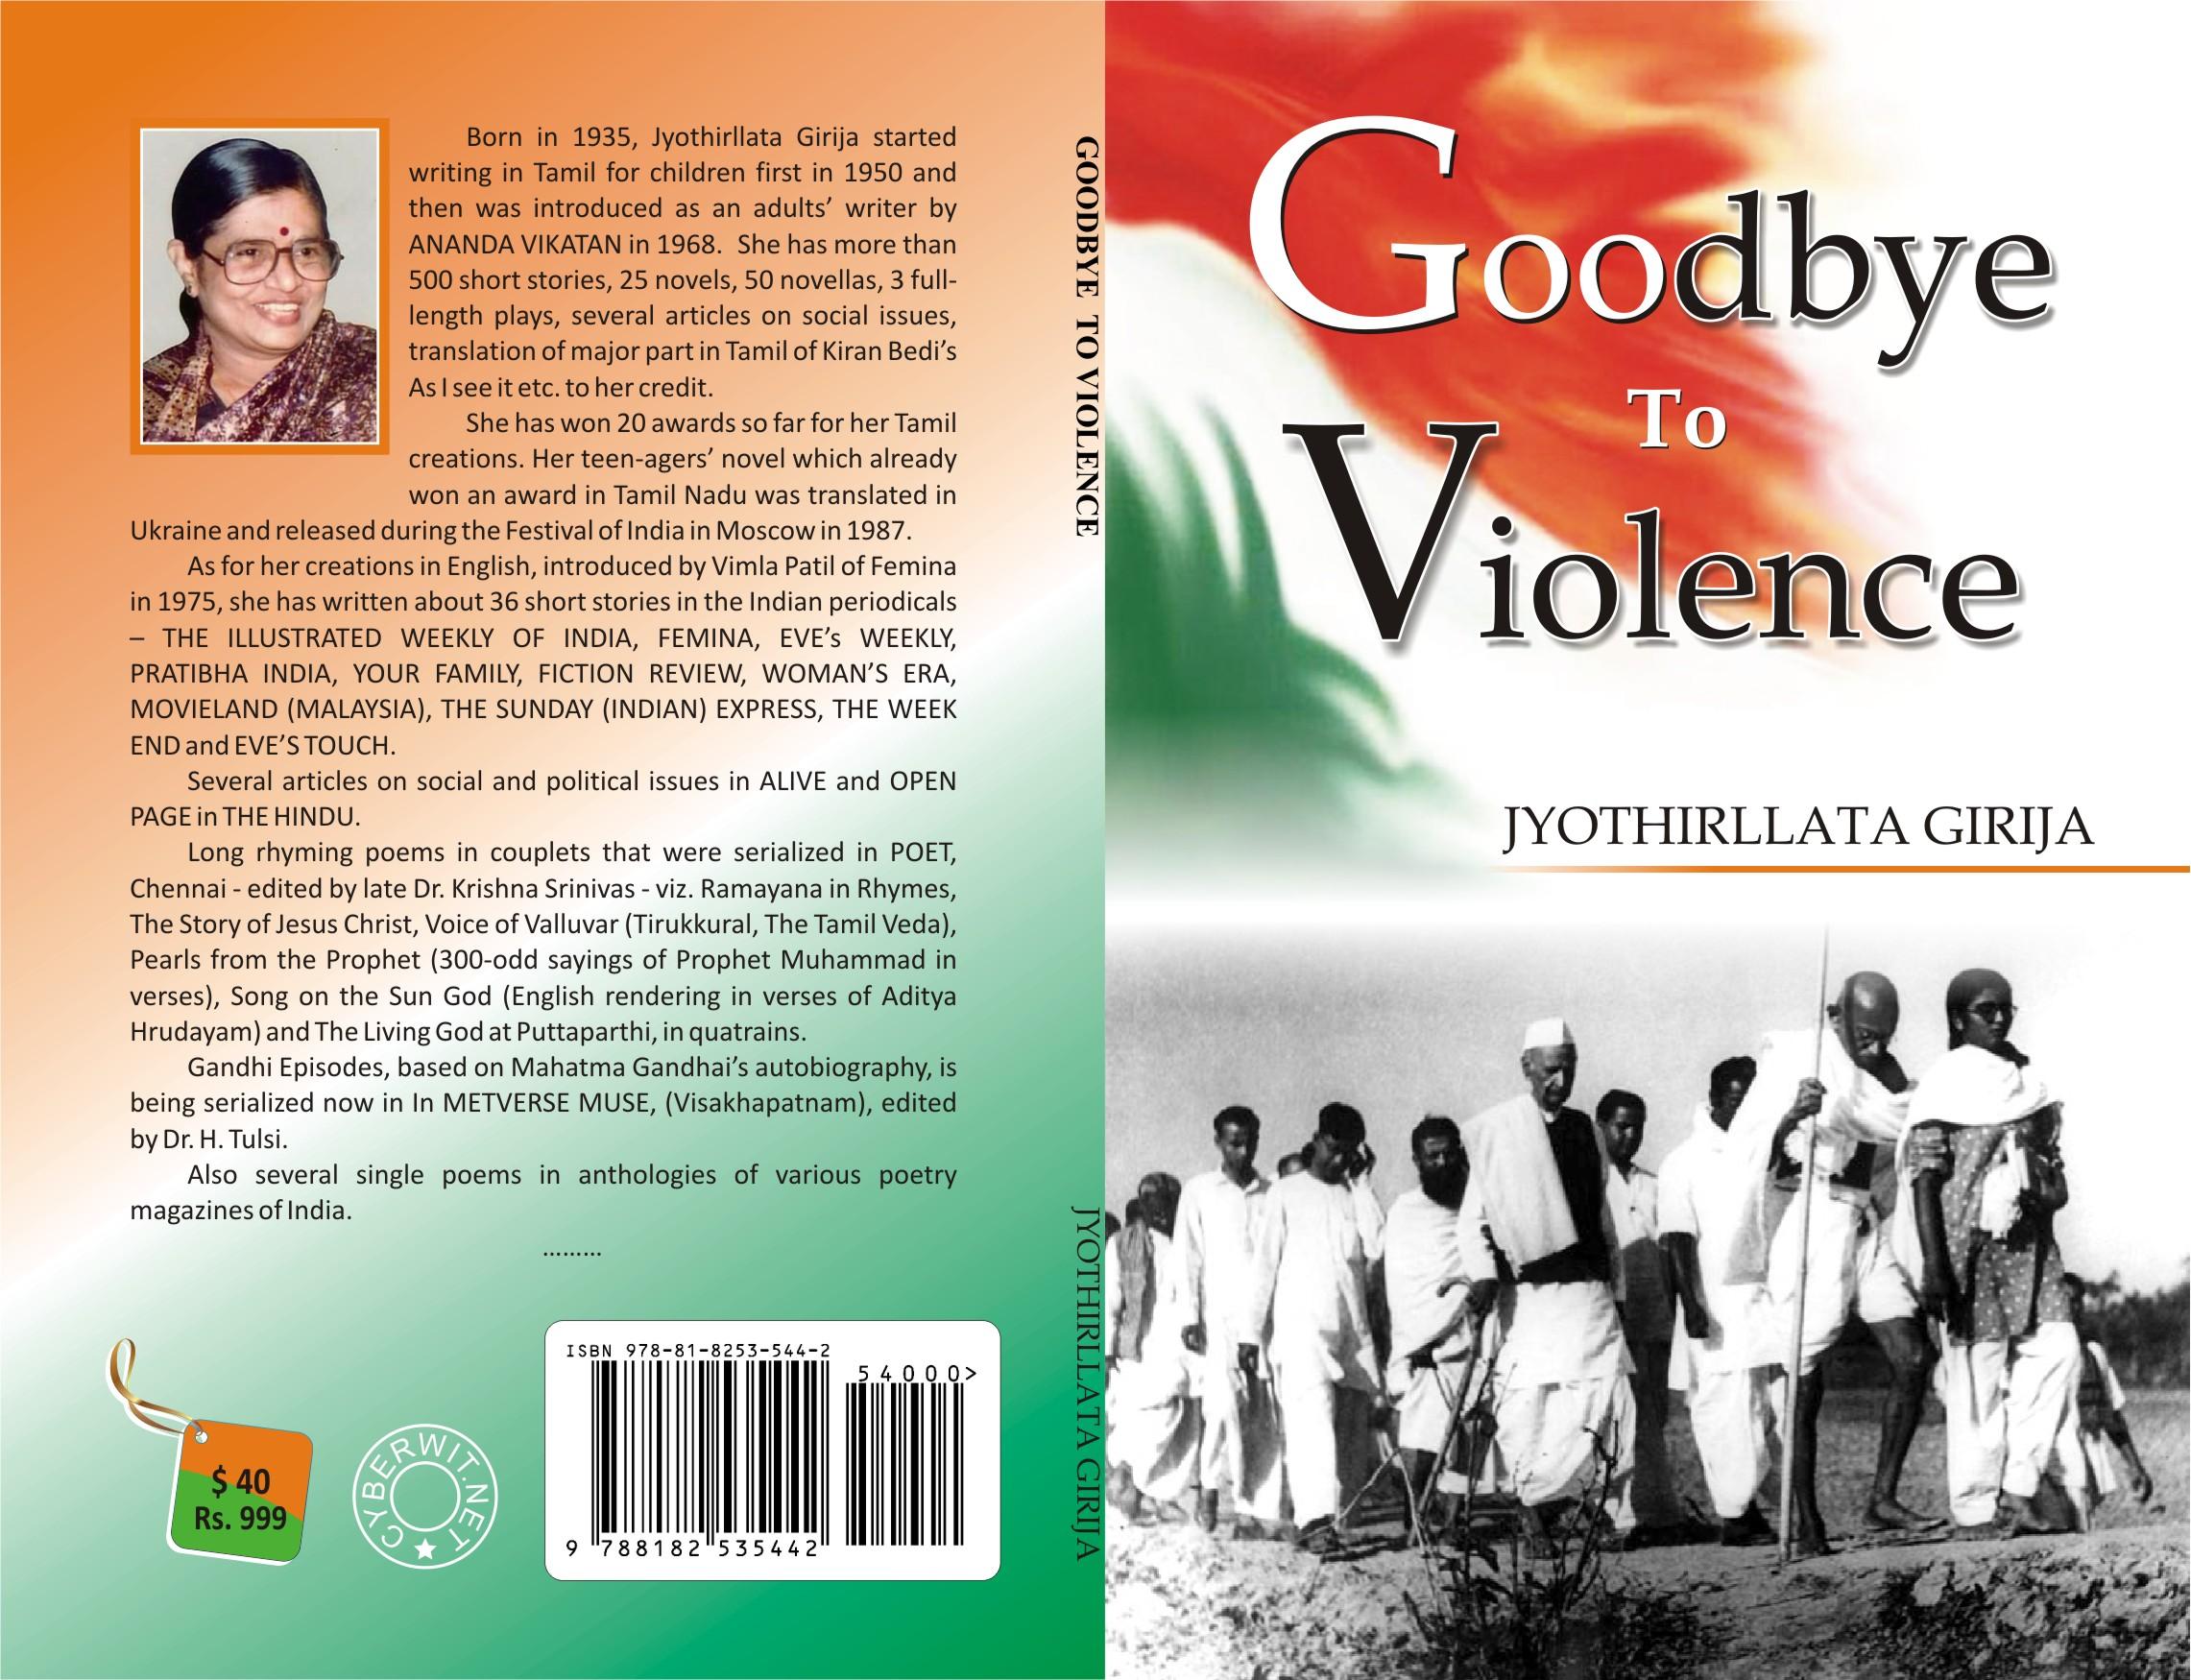 Goodbye to Violence – A transcreation of Jyothirllata Girija novel Manikkodi – Published